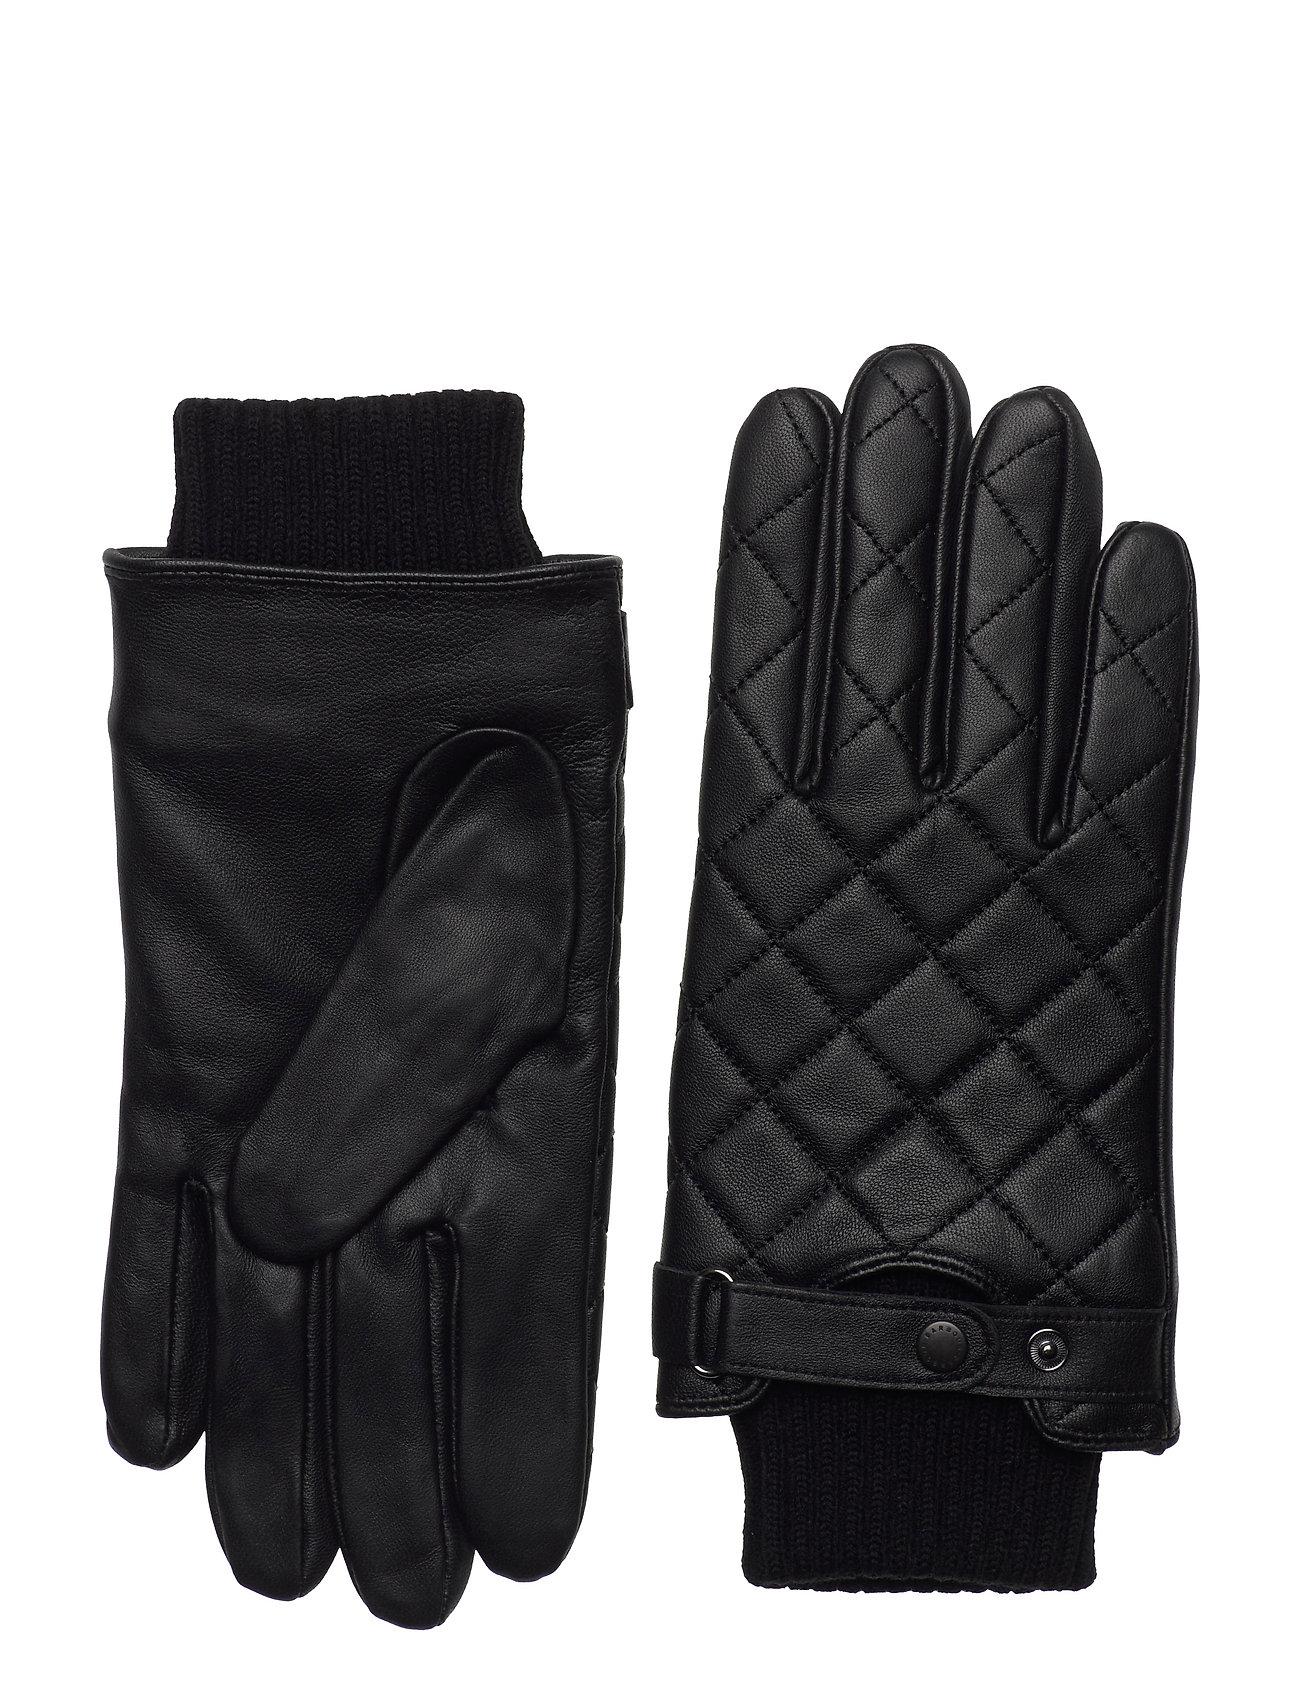 Barbour Quilted Leather Glove Handsker Sort Barbour